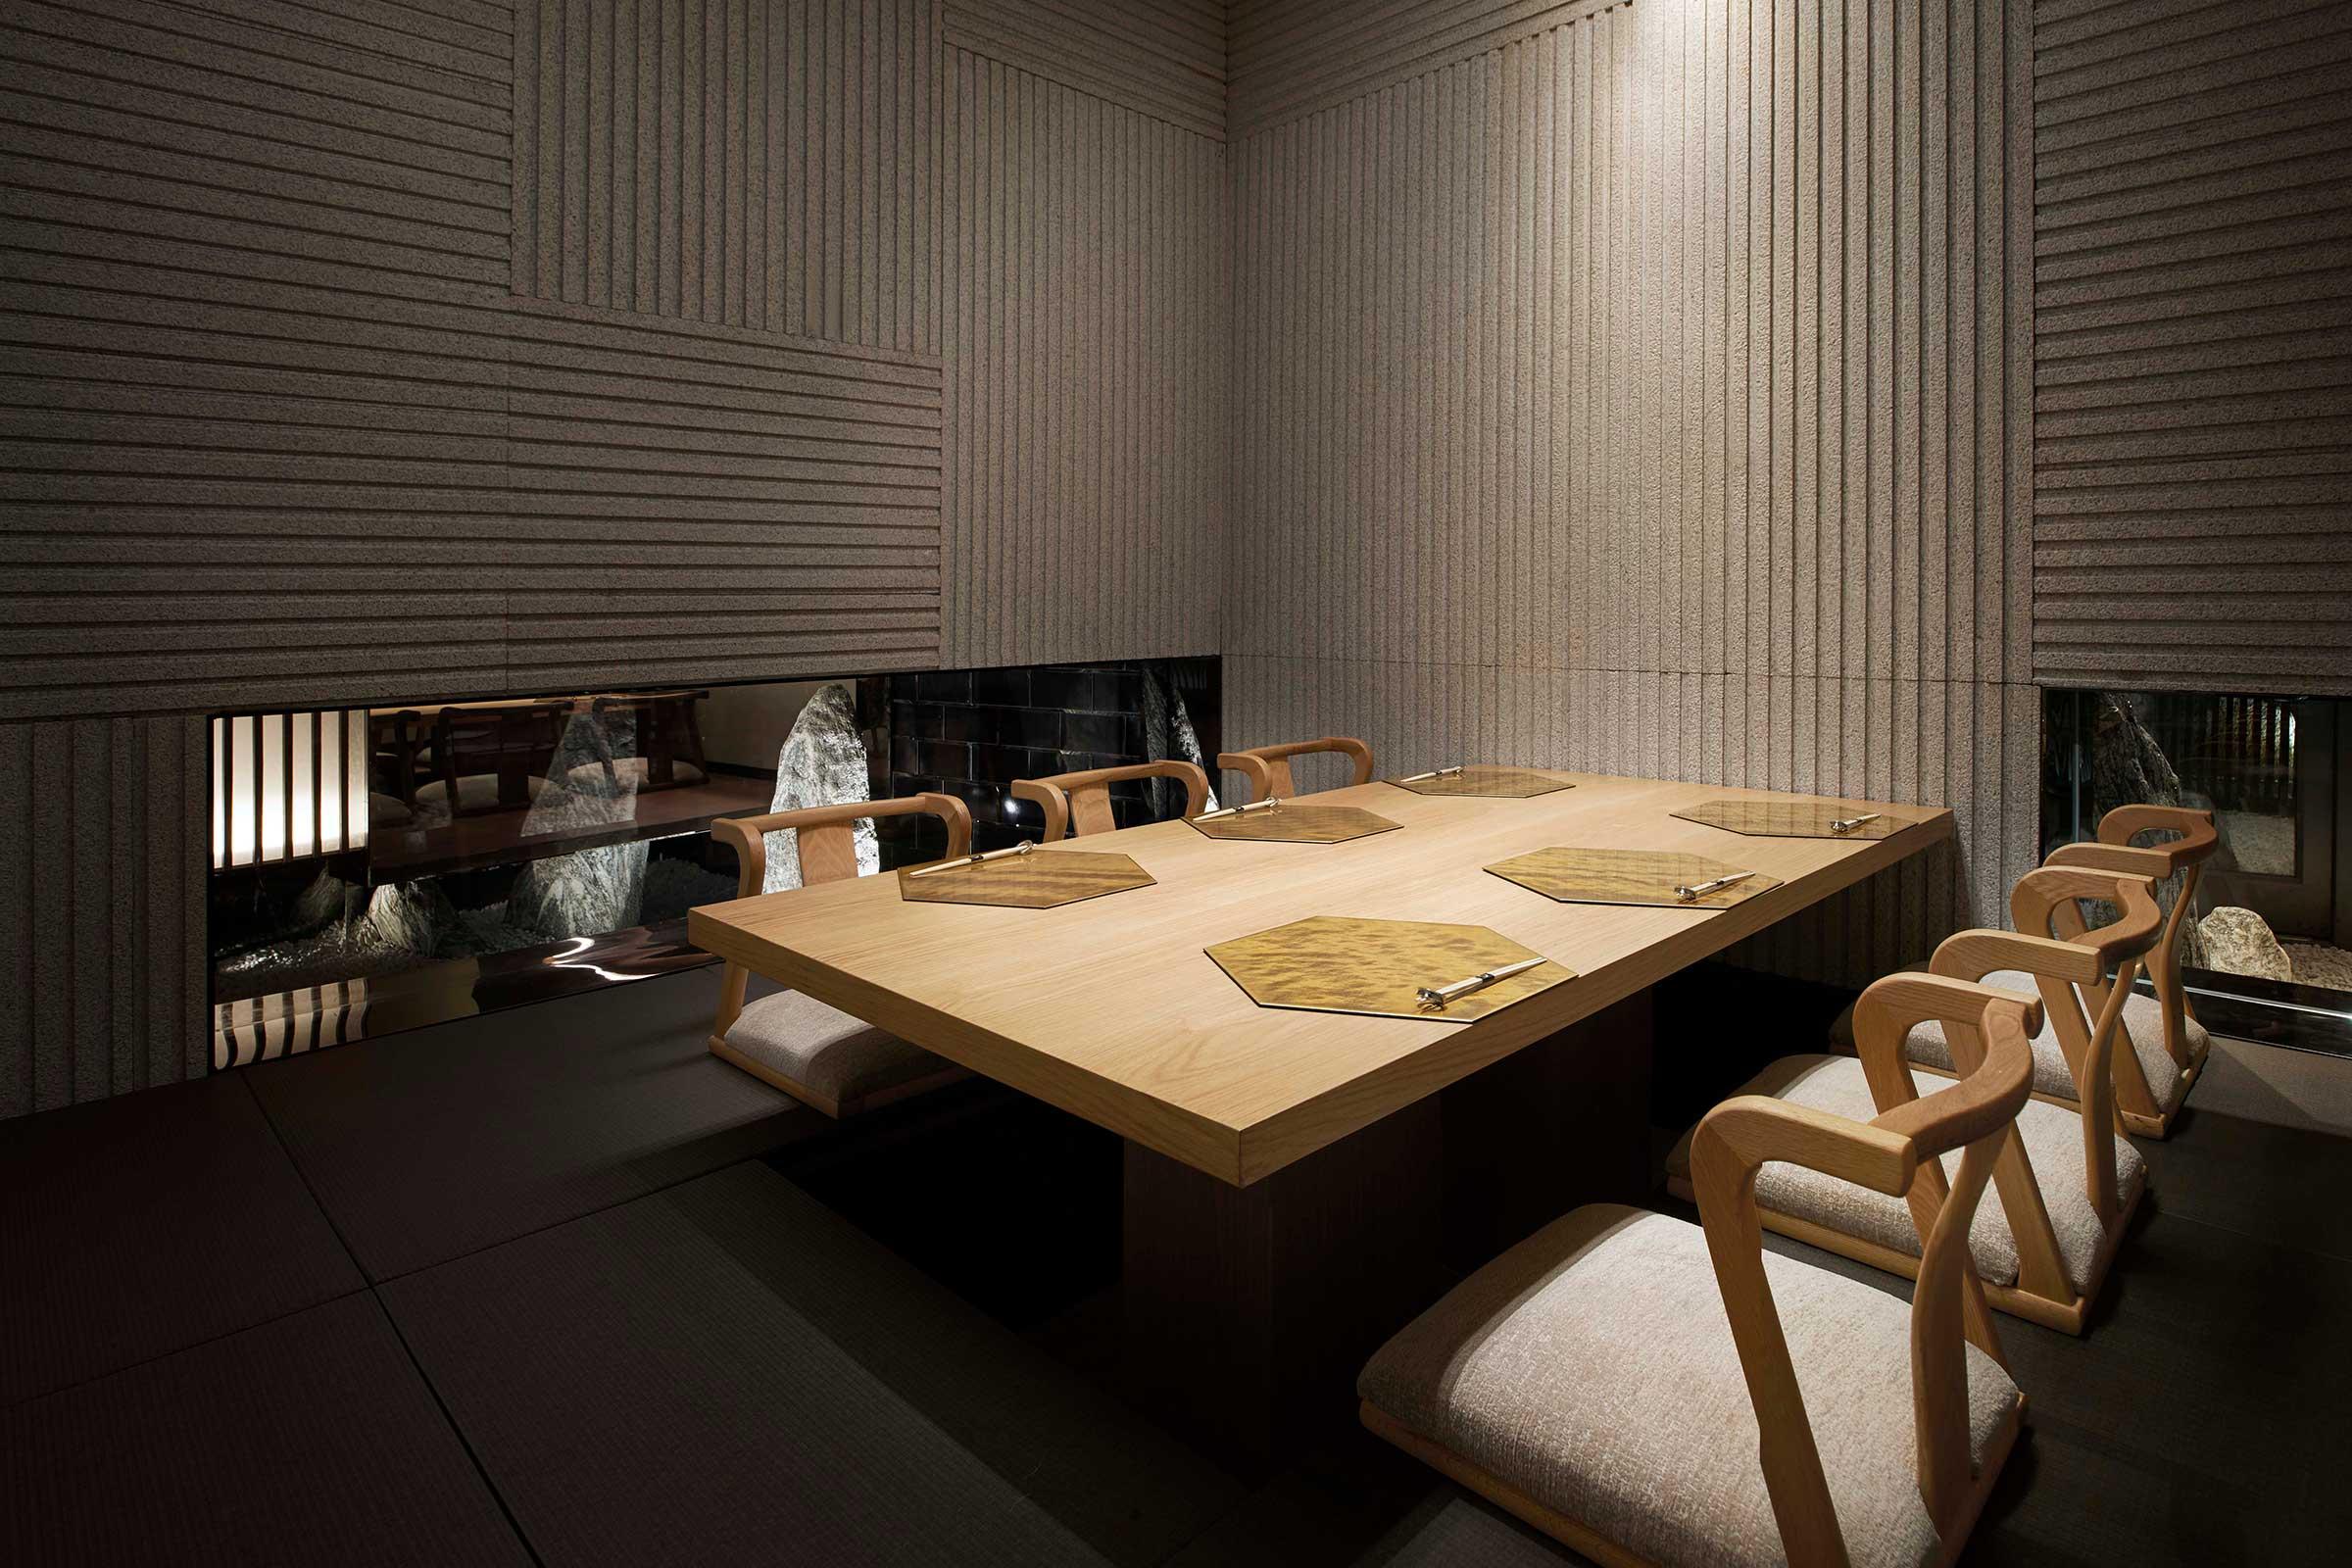 6-person-tatami-room-a.jpg